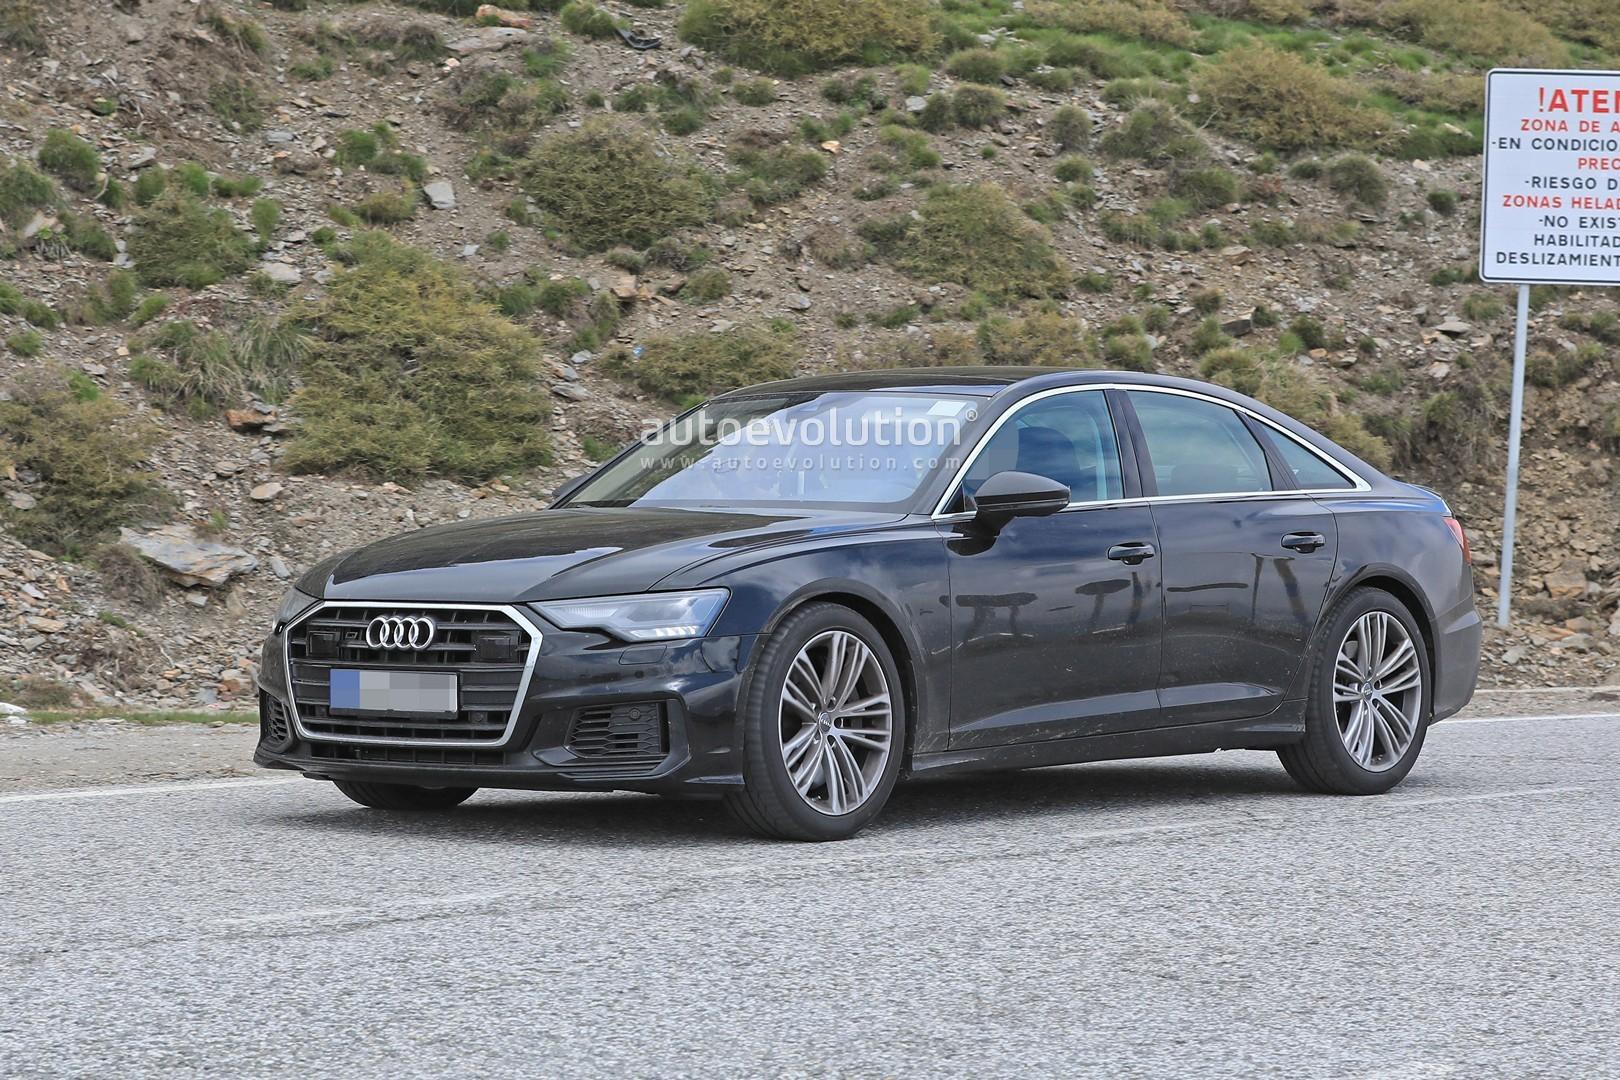 2019 Audi S6 Sedan Spied With Quad Exhaust - autoevolution